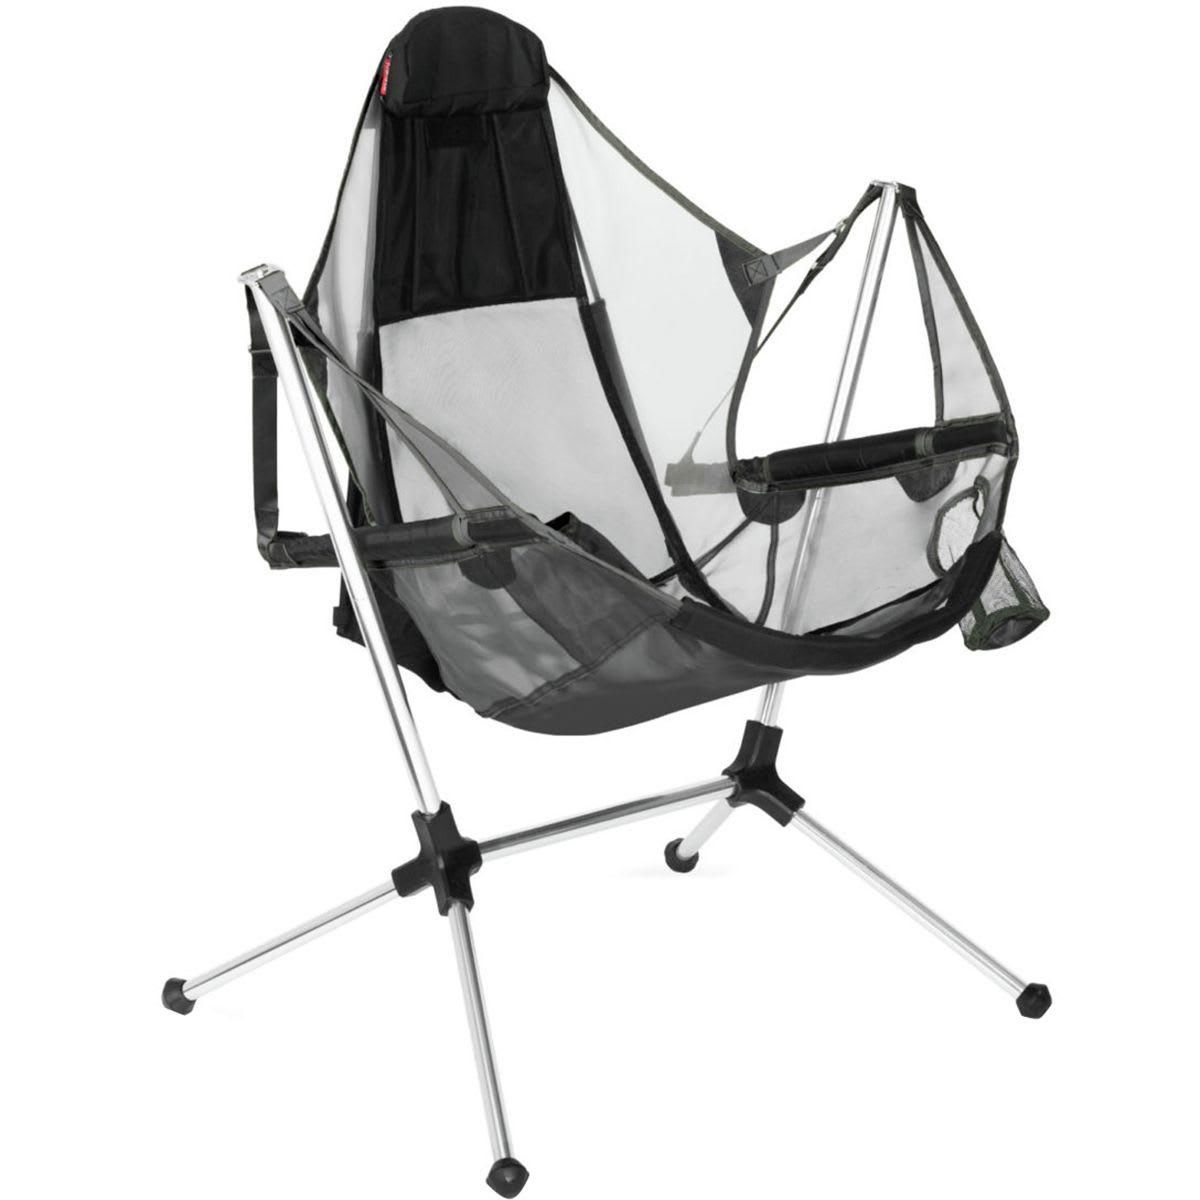 Nemo Stargaze Luxury Recliner Camp Chair 2019